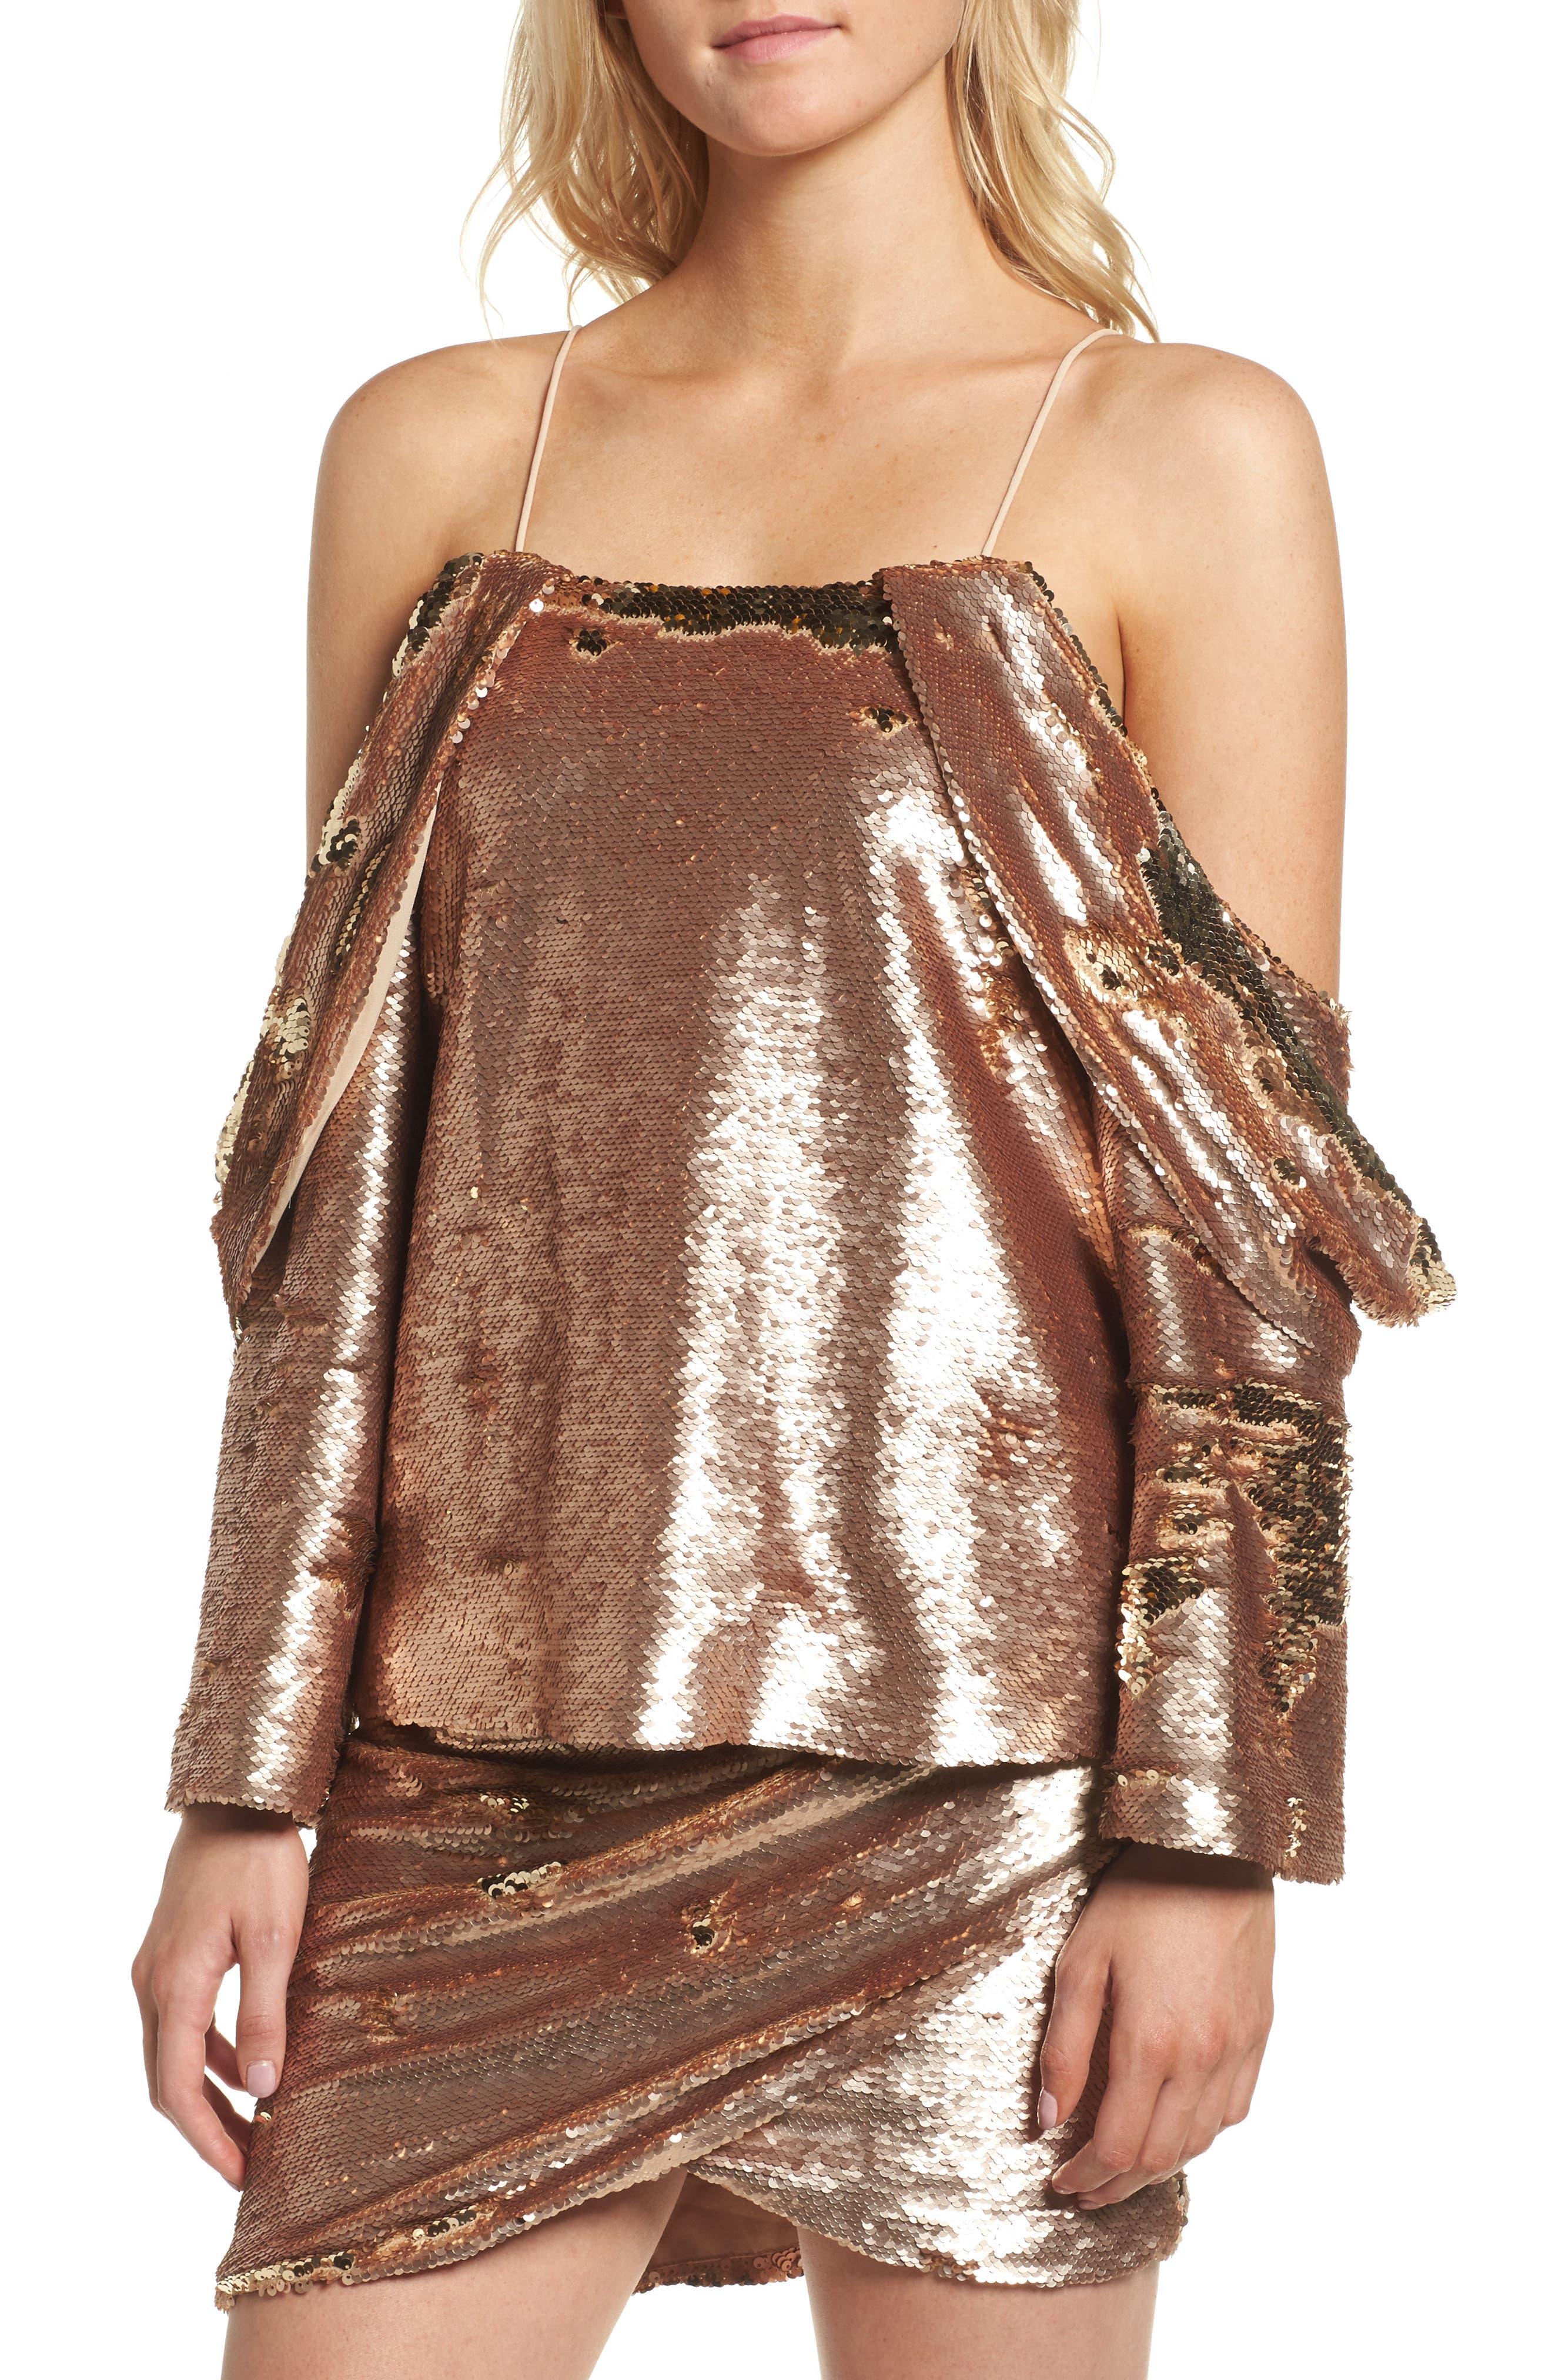 Revolution Off the Shoulder Sequin Top,                         Main,                         color, Champagne Blush